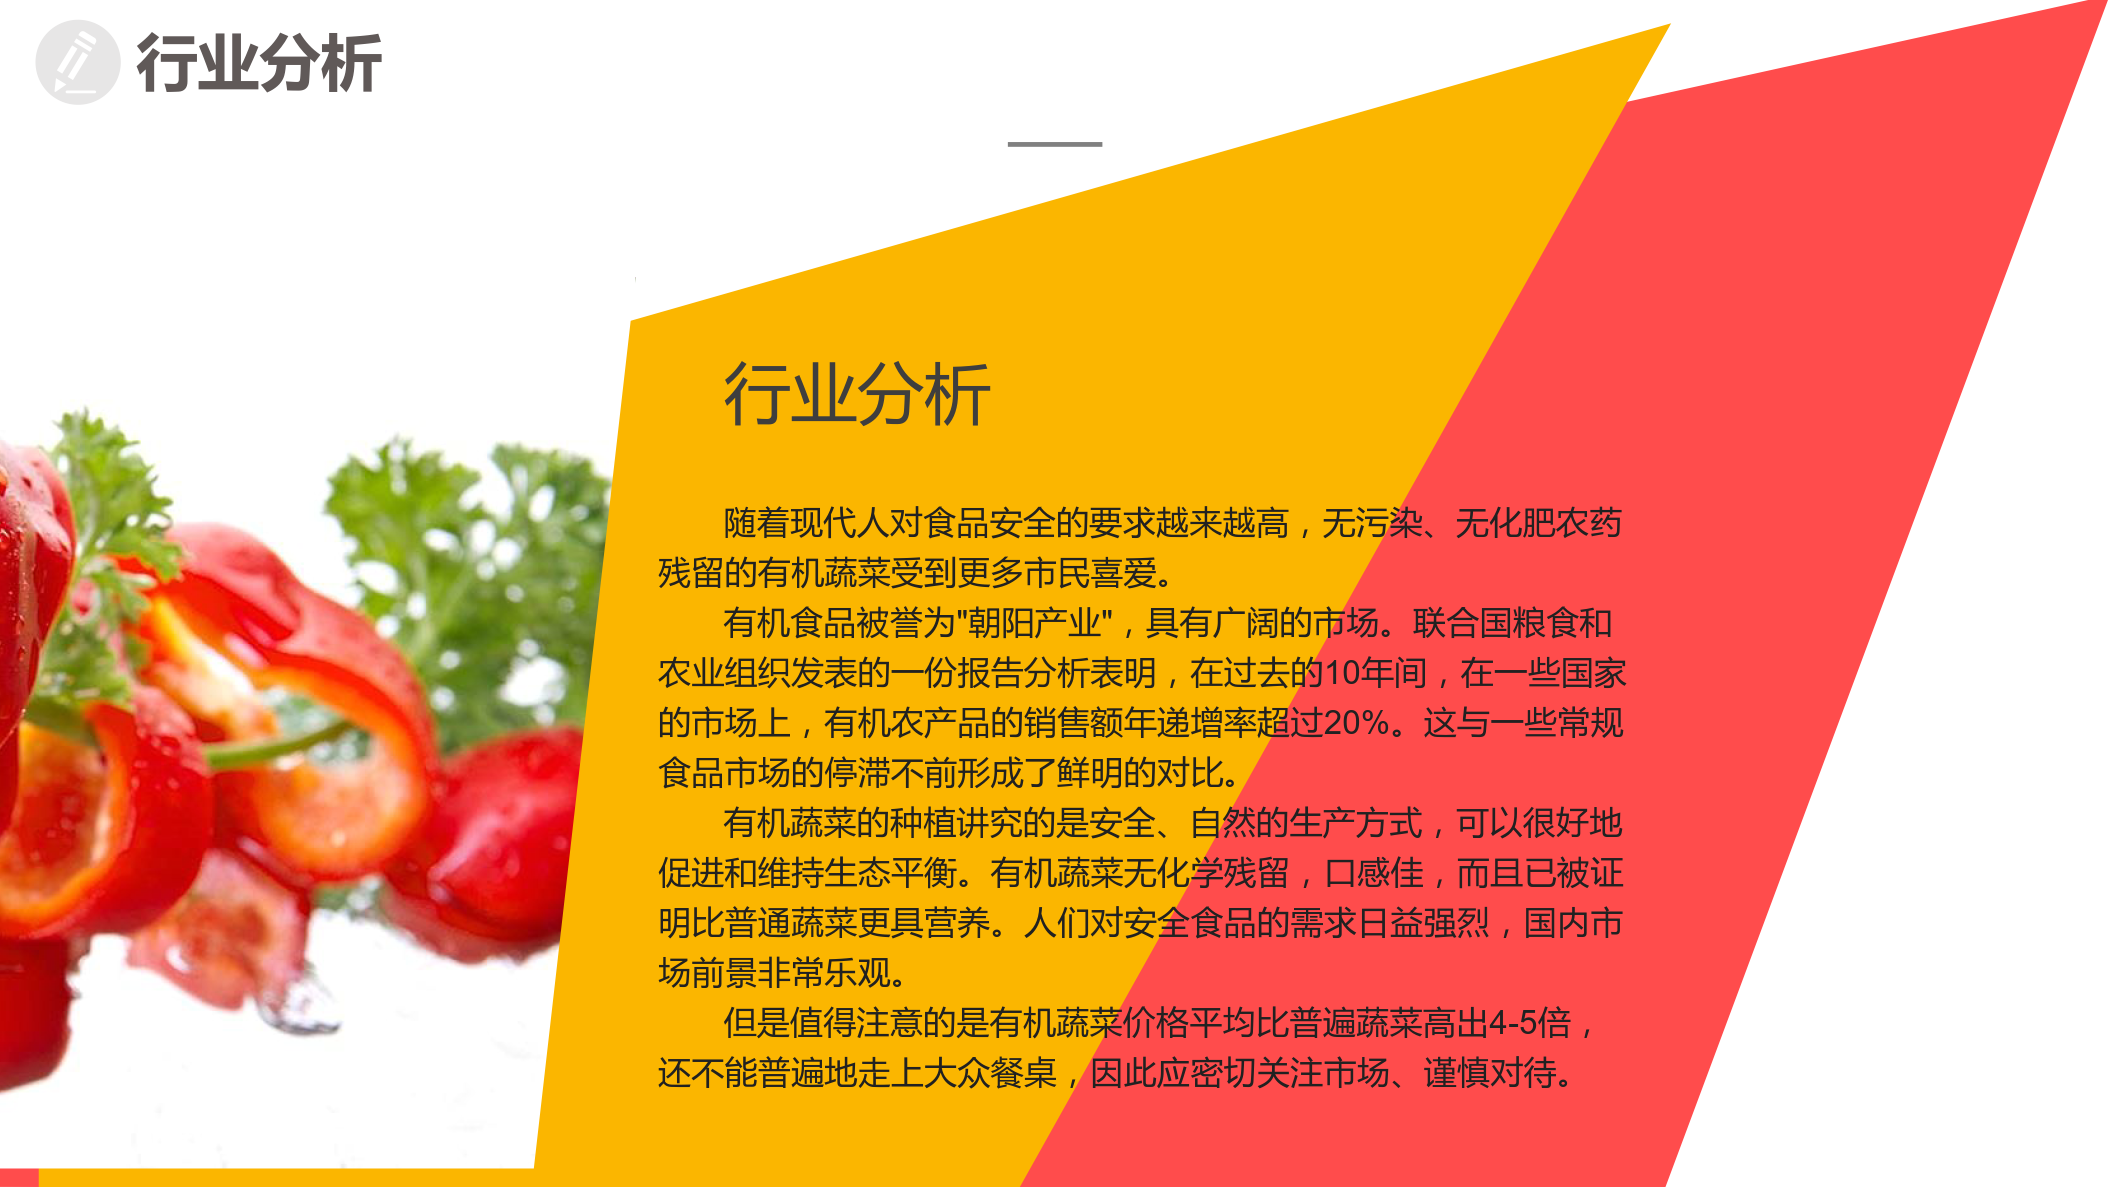 F1+vbj村小爱+软件游戏+张洁0608_5.png